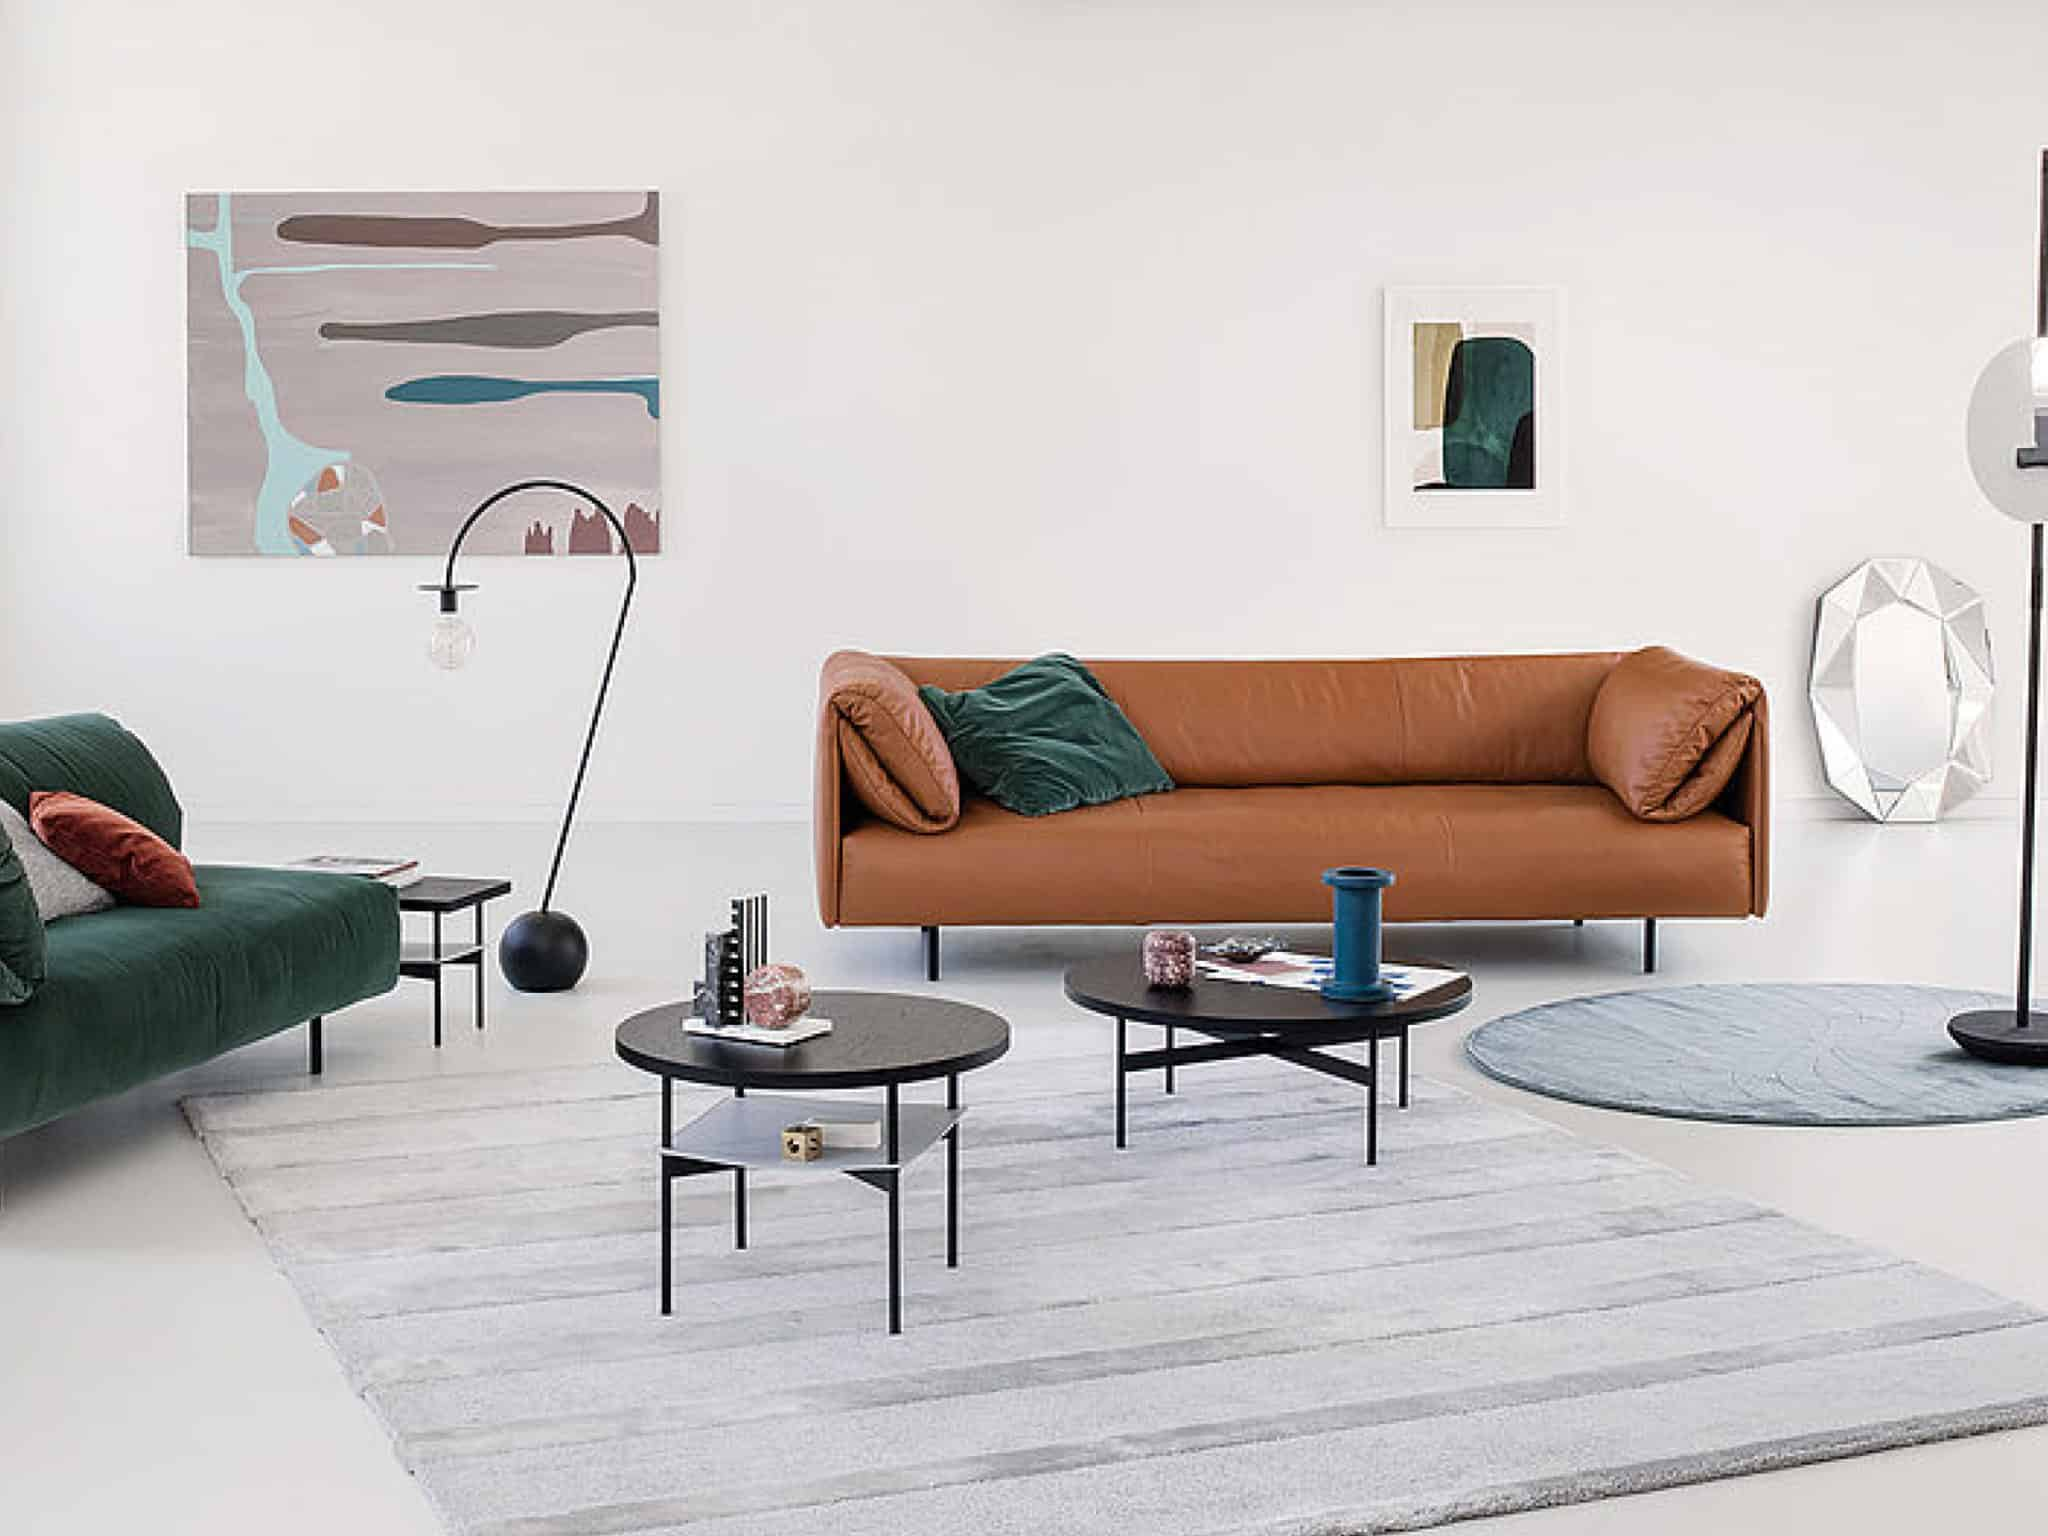 Rolf Benz Design Salontafel.Rolf Benz Salontafel 925 De Donjon Meubelen Eindhoven